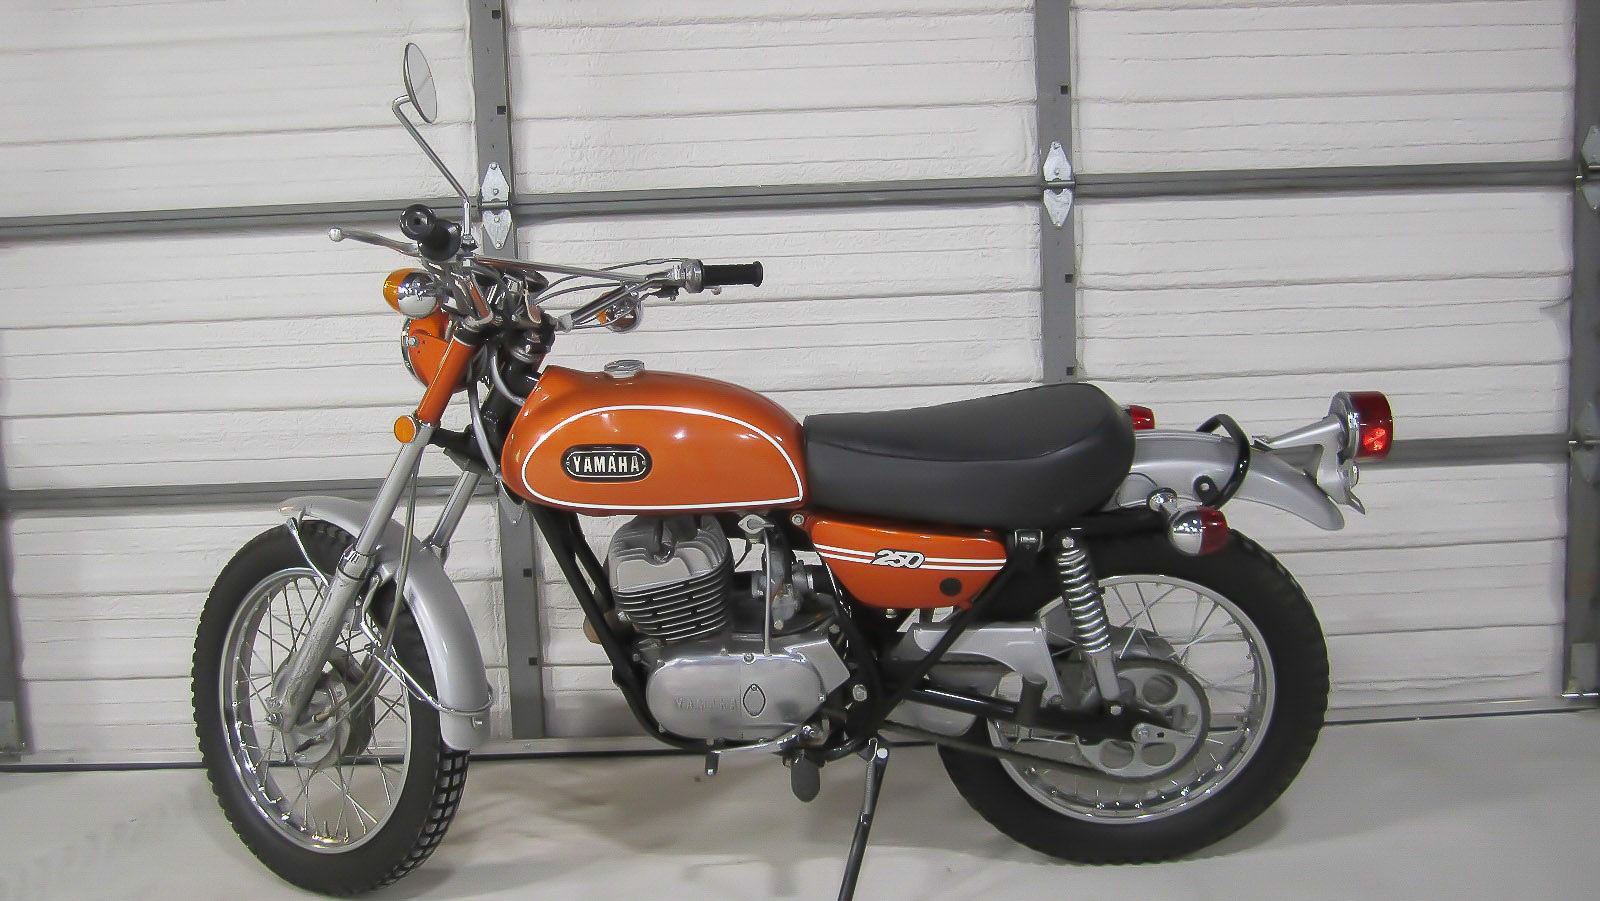 Yamaha DT 1